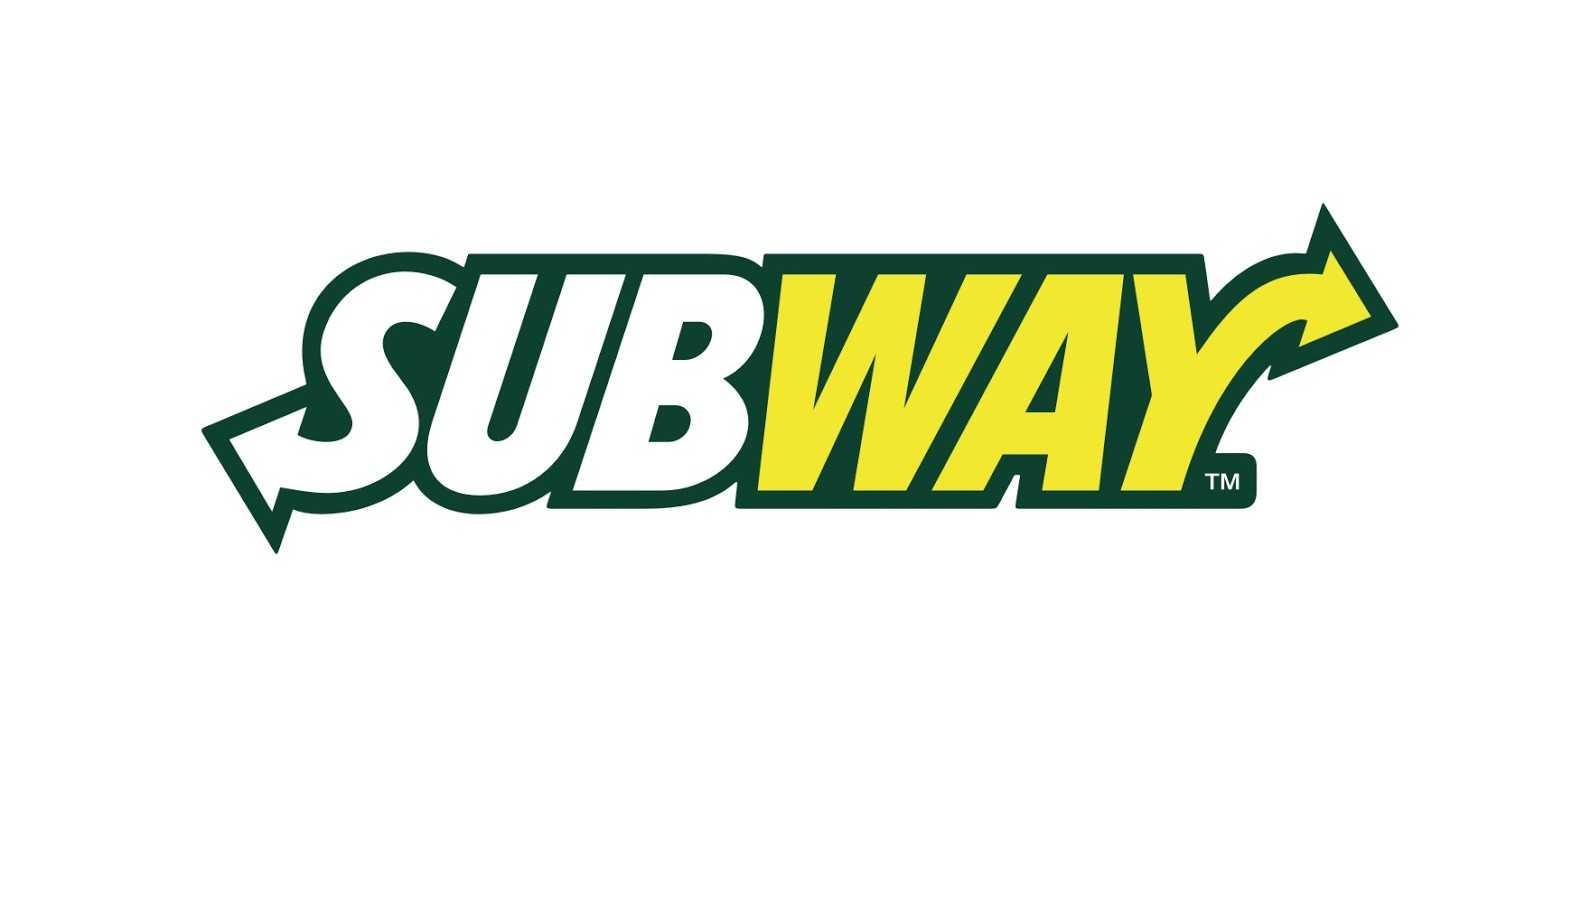 Nice - Subway Meyerber